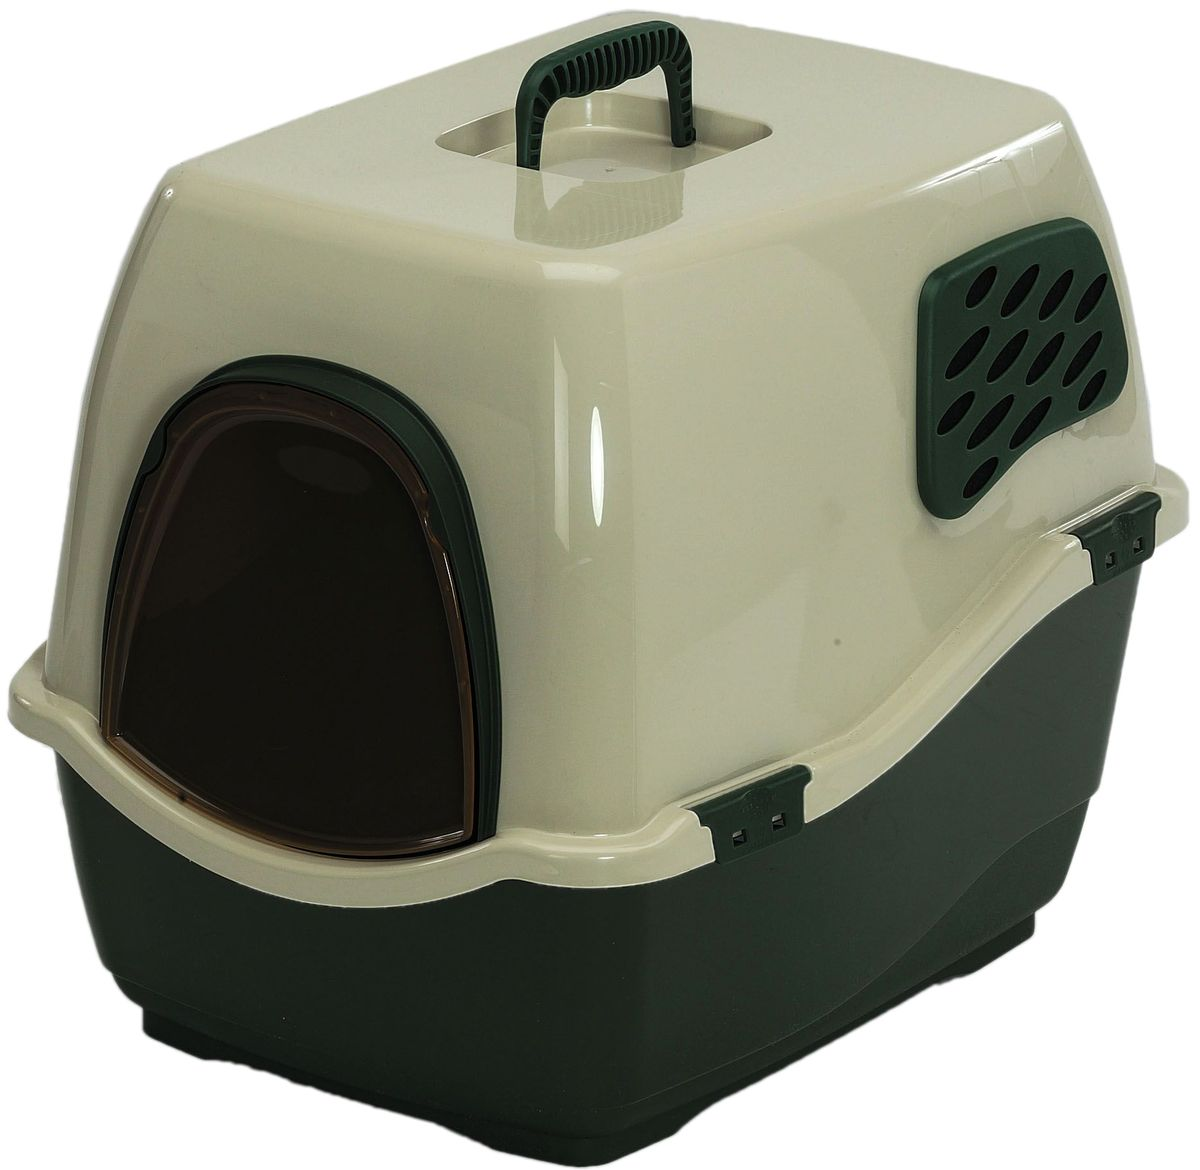 Био-туалет для кошек Marchioro  Bill 1F , цвет: зеленый, бежевый, 50 х 40 х 42 см